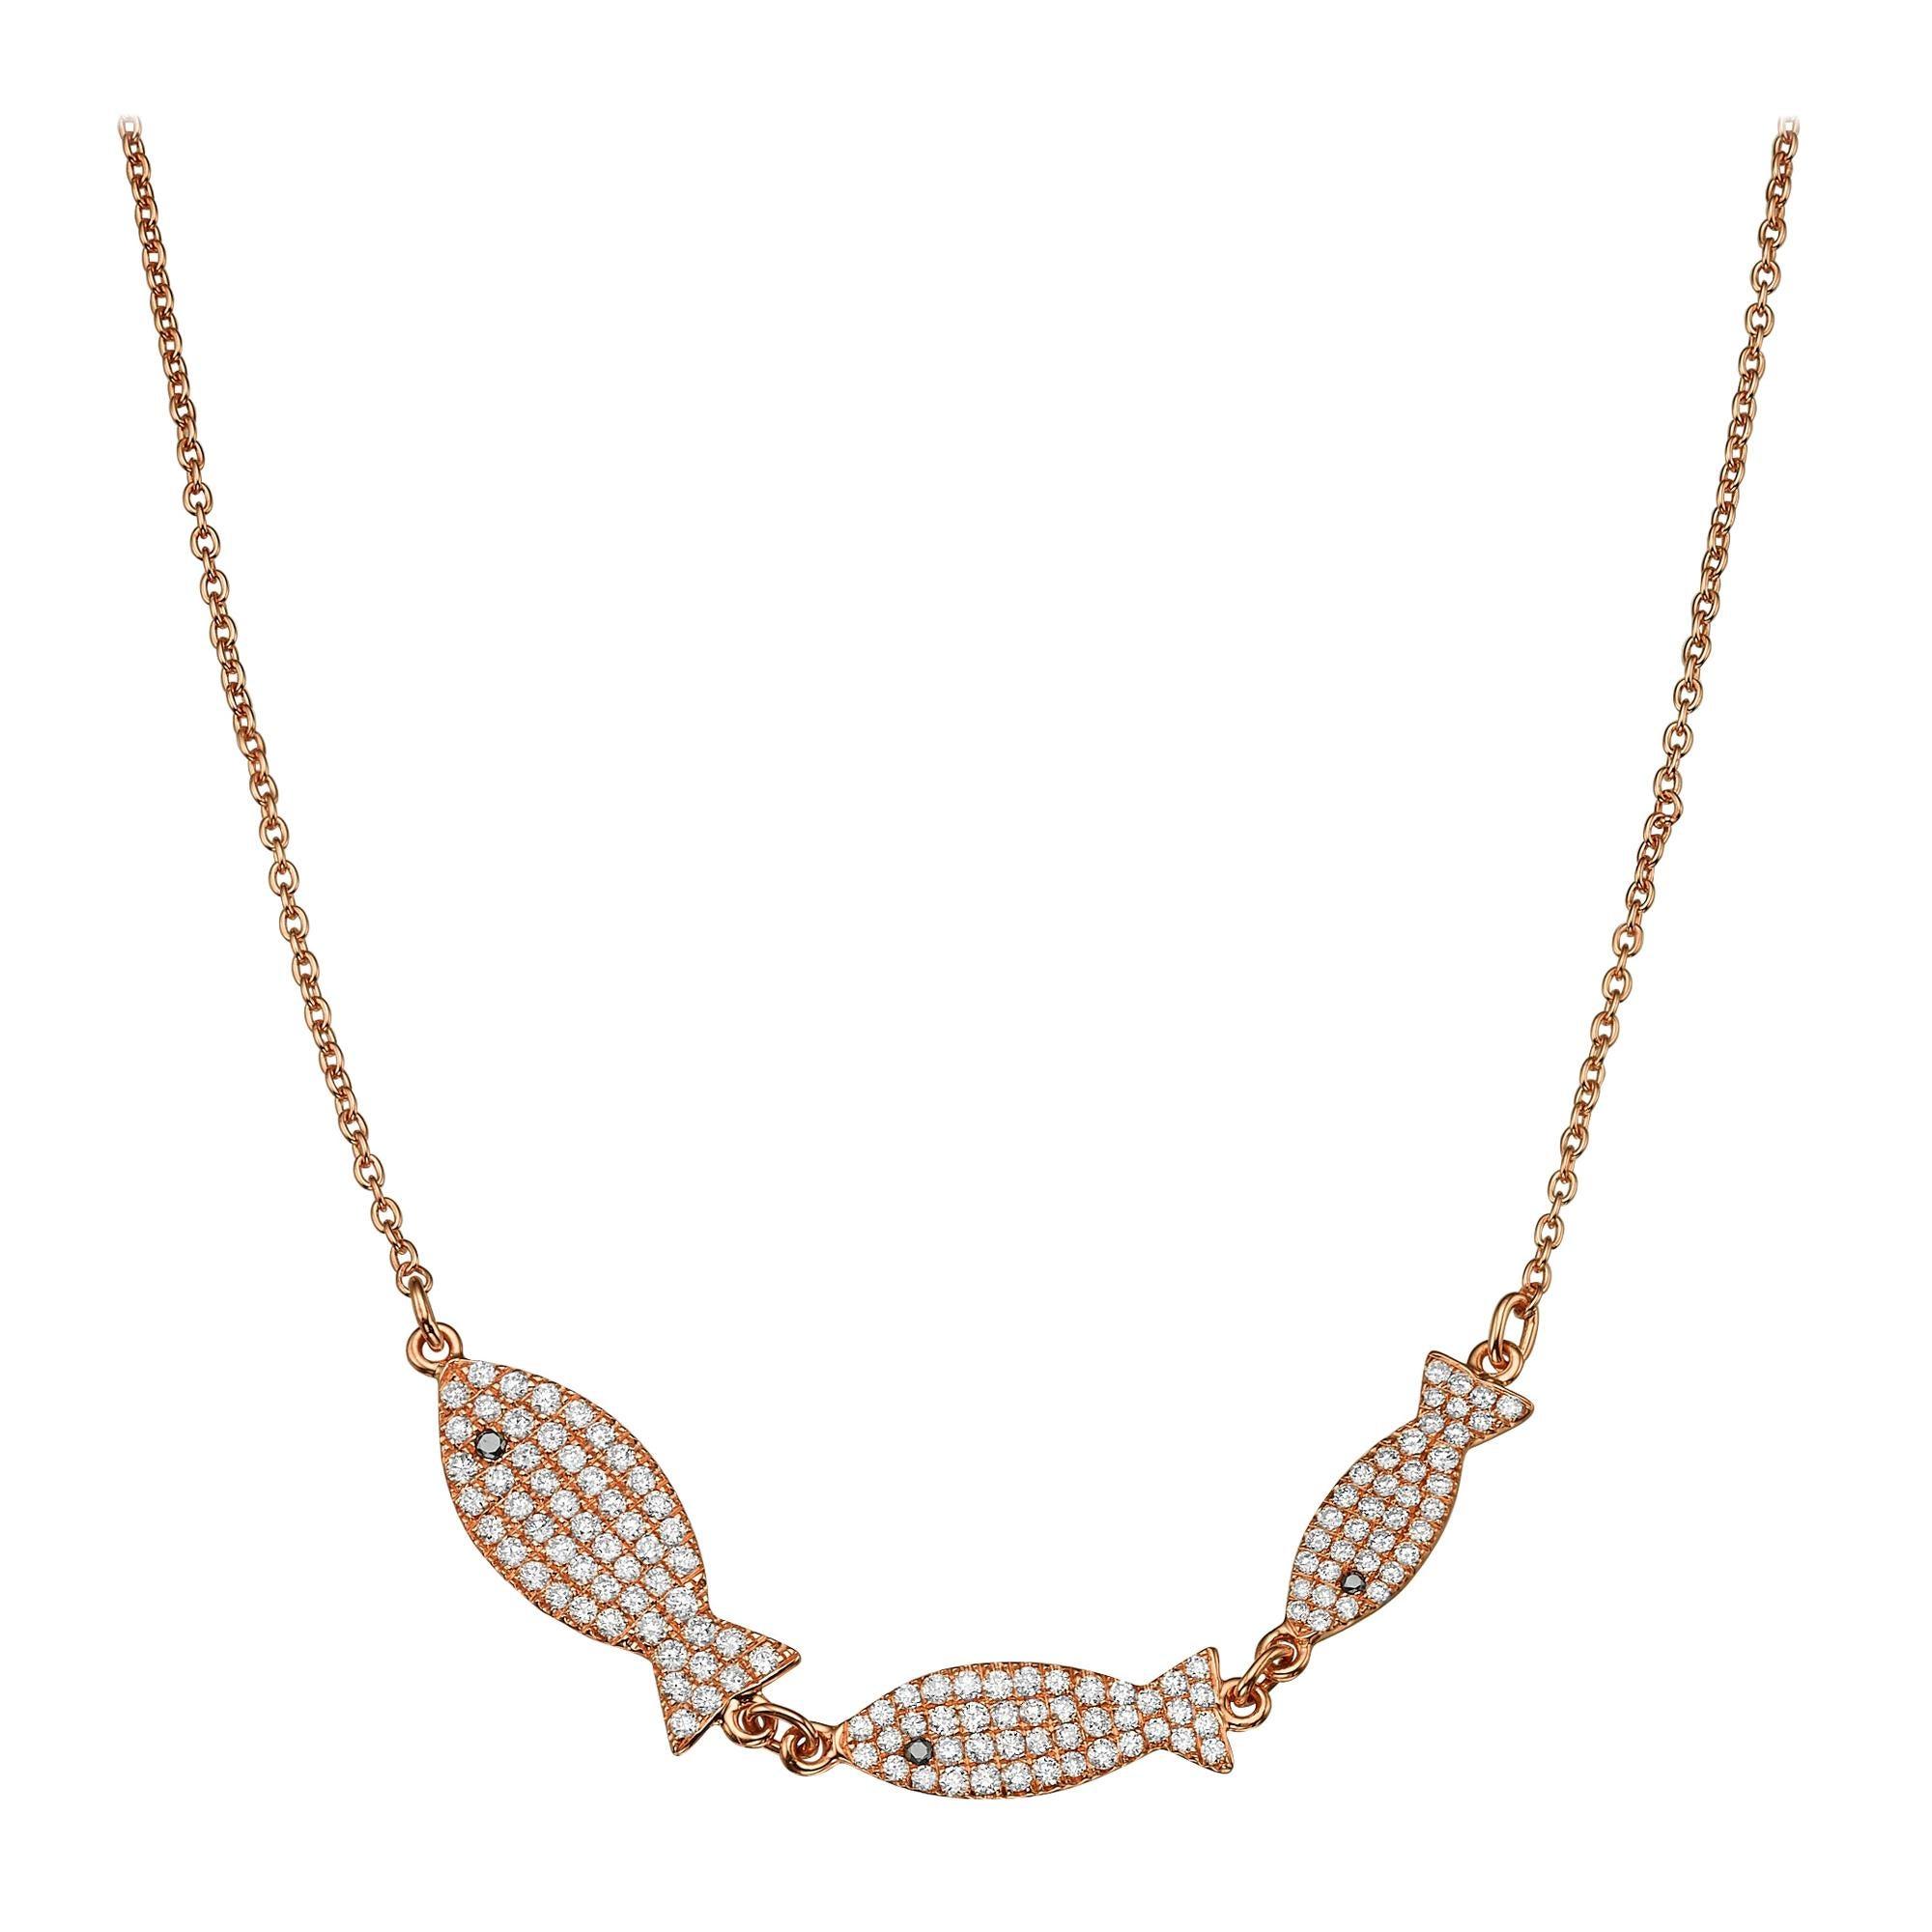 18k Gold, 0.73 Carat, F Color, VS Clarity, Diamond Crusted Fish Pendant Necklace